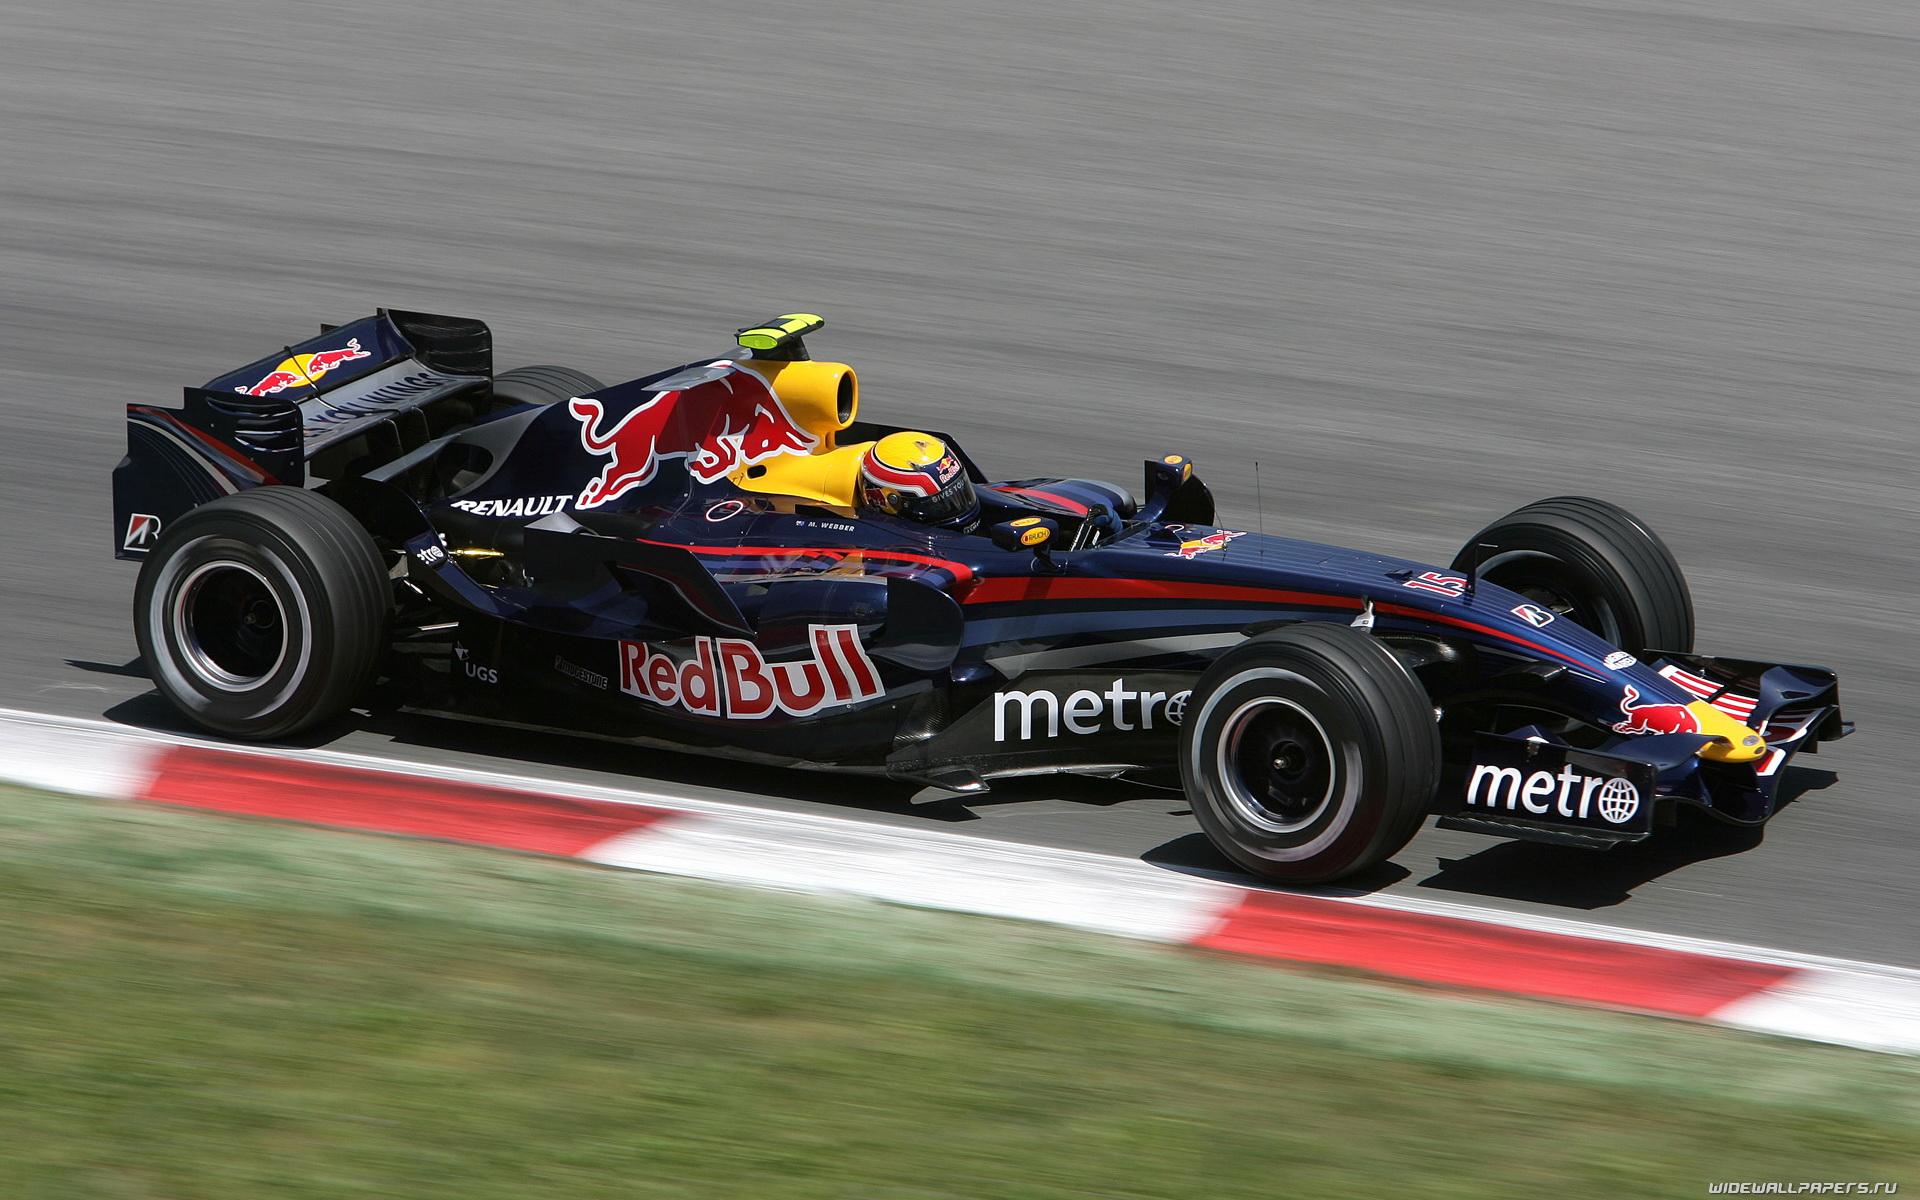 Формулы-1 фото